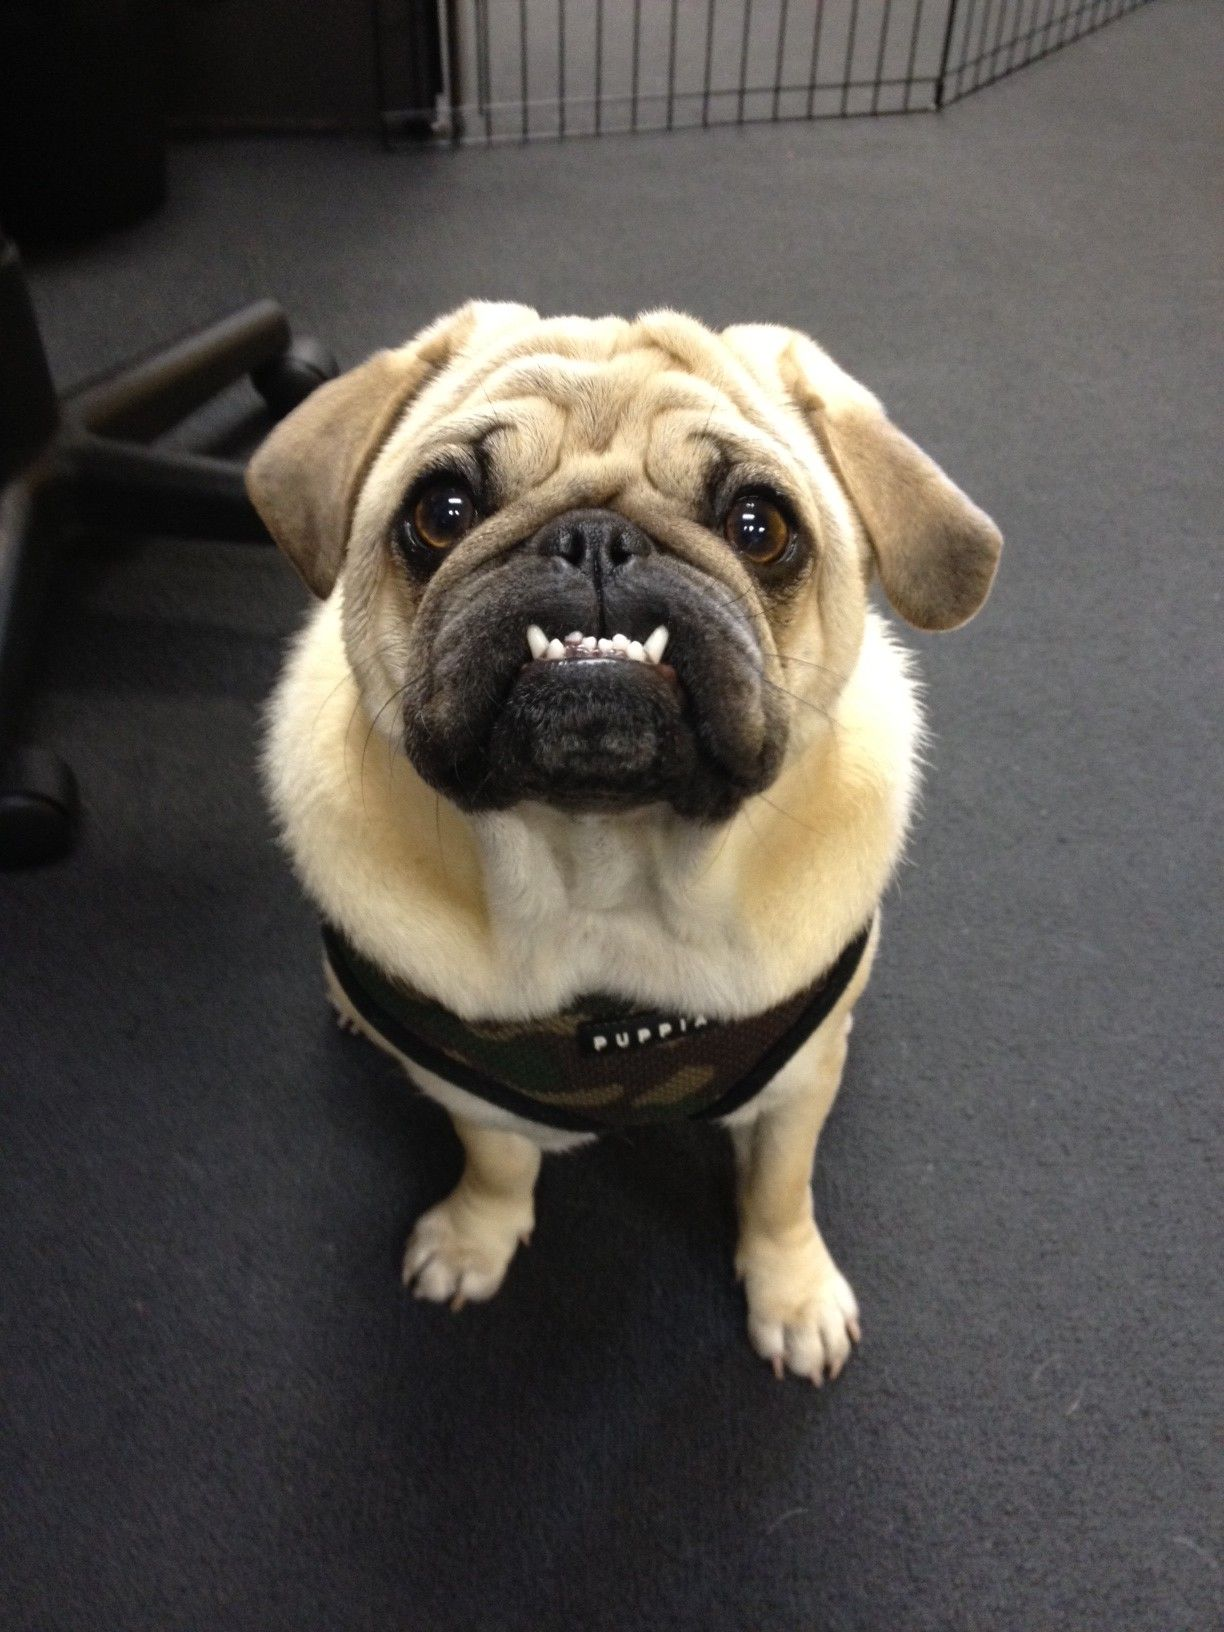 pet insurance that covers dental treatment